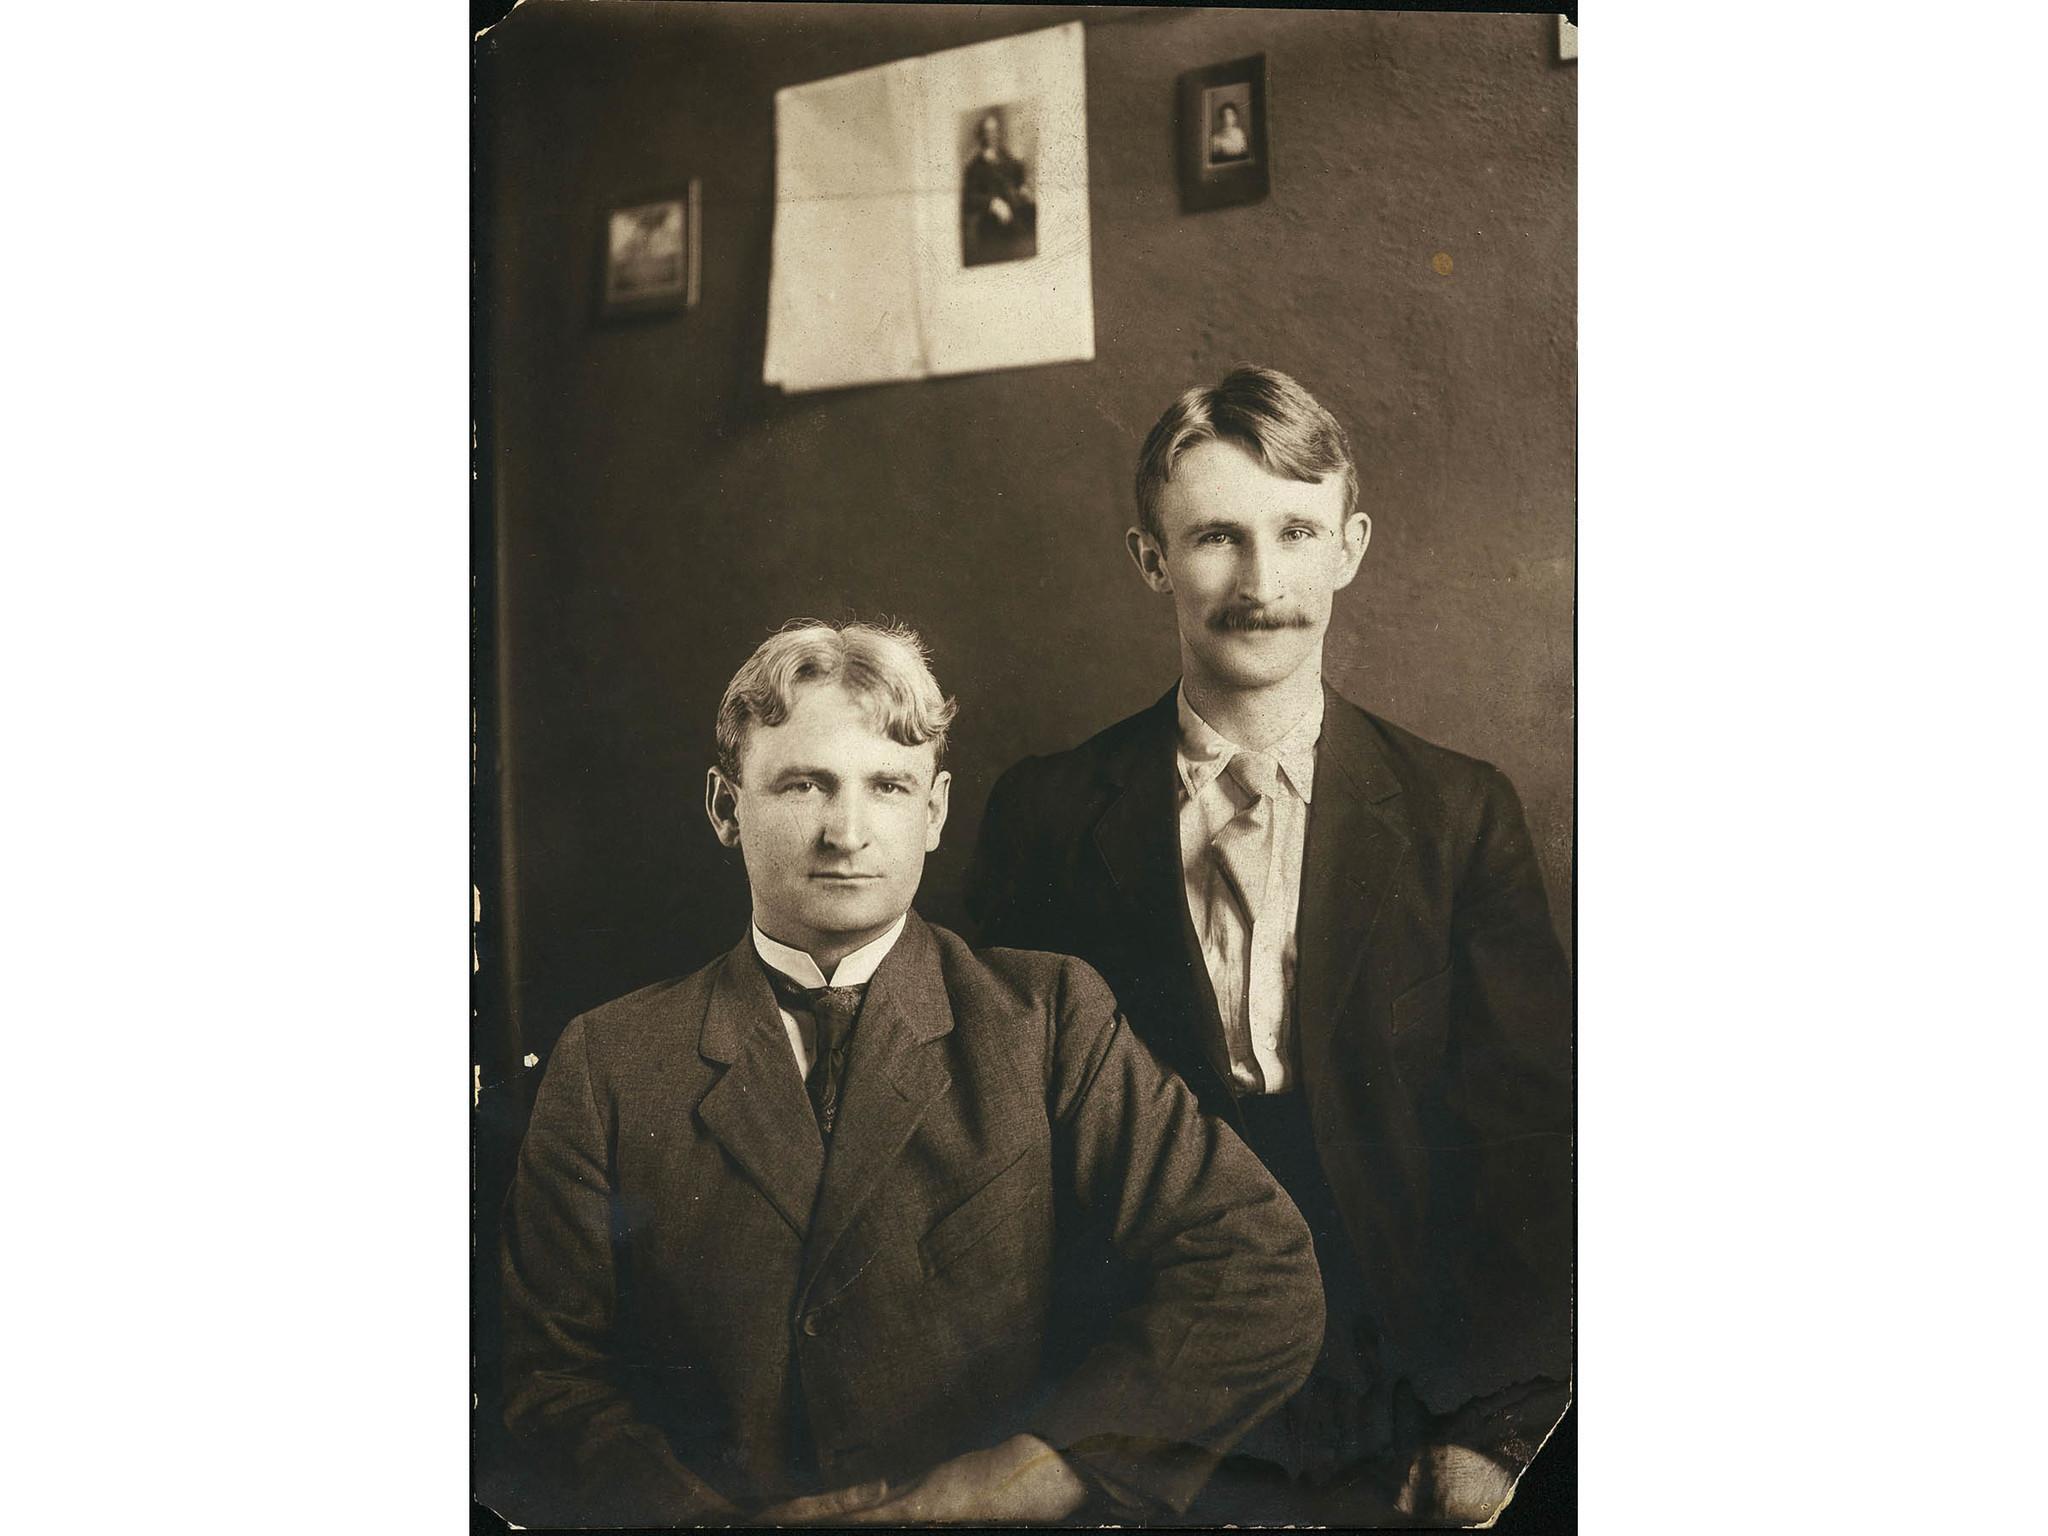 An undated photo of John J. McNamara, left, secretary-treasurer of the International Assn. of Bridge